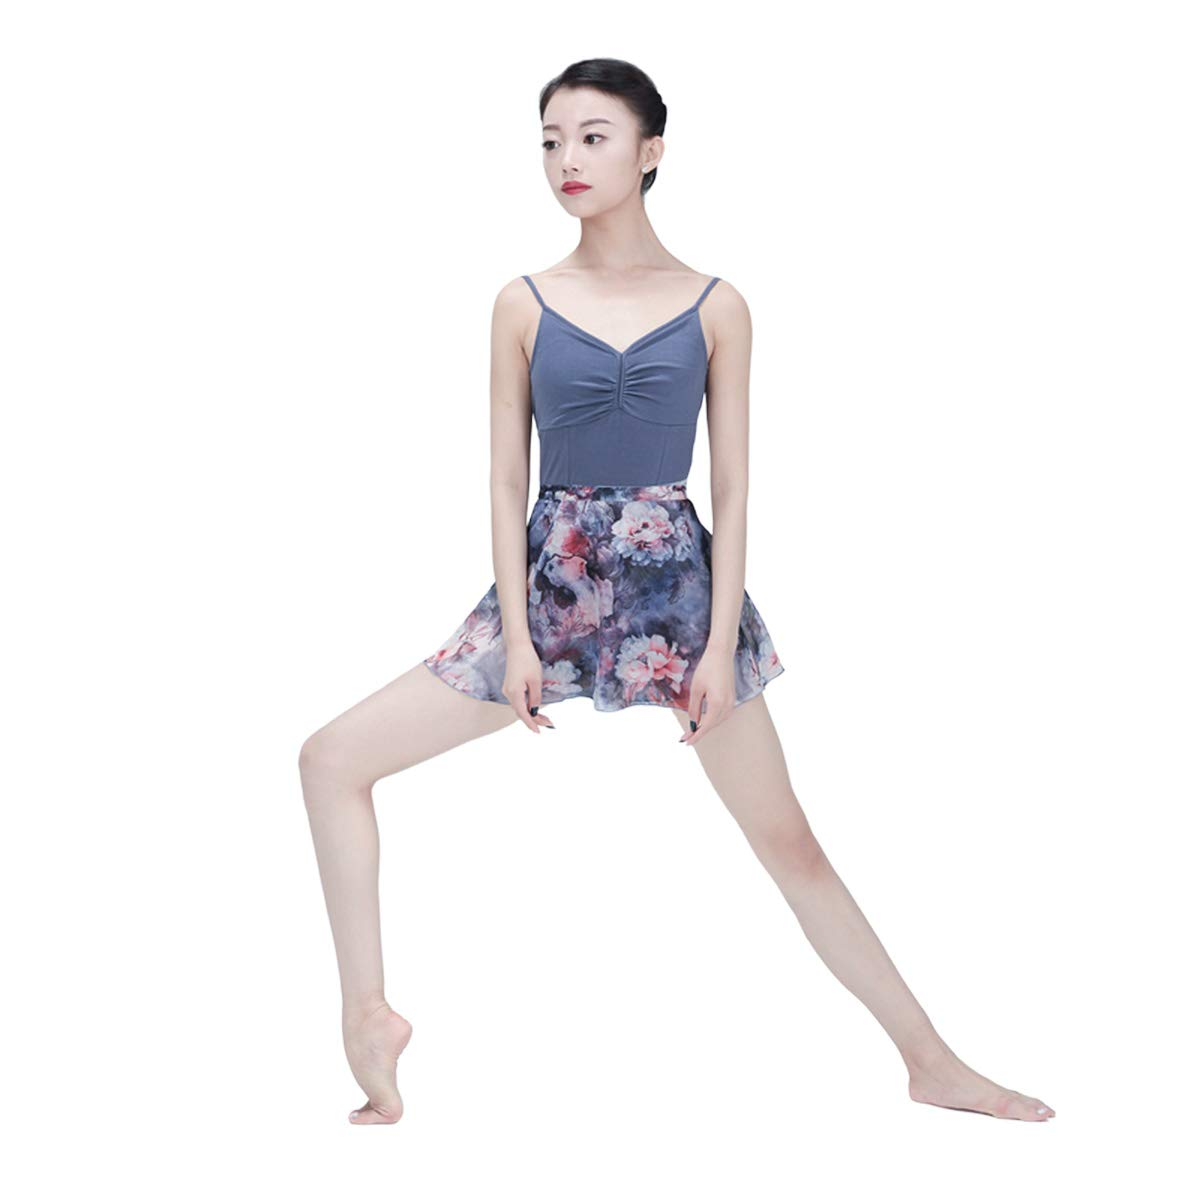 Baiw Dance APPAREL ガールズ B07G4C3L3D  グレー XL 175